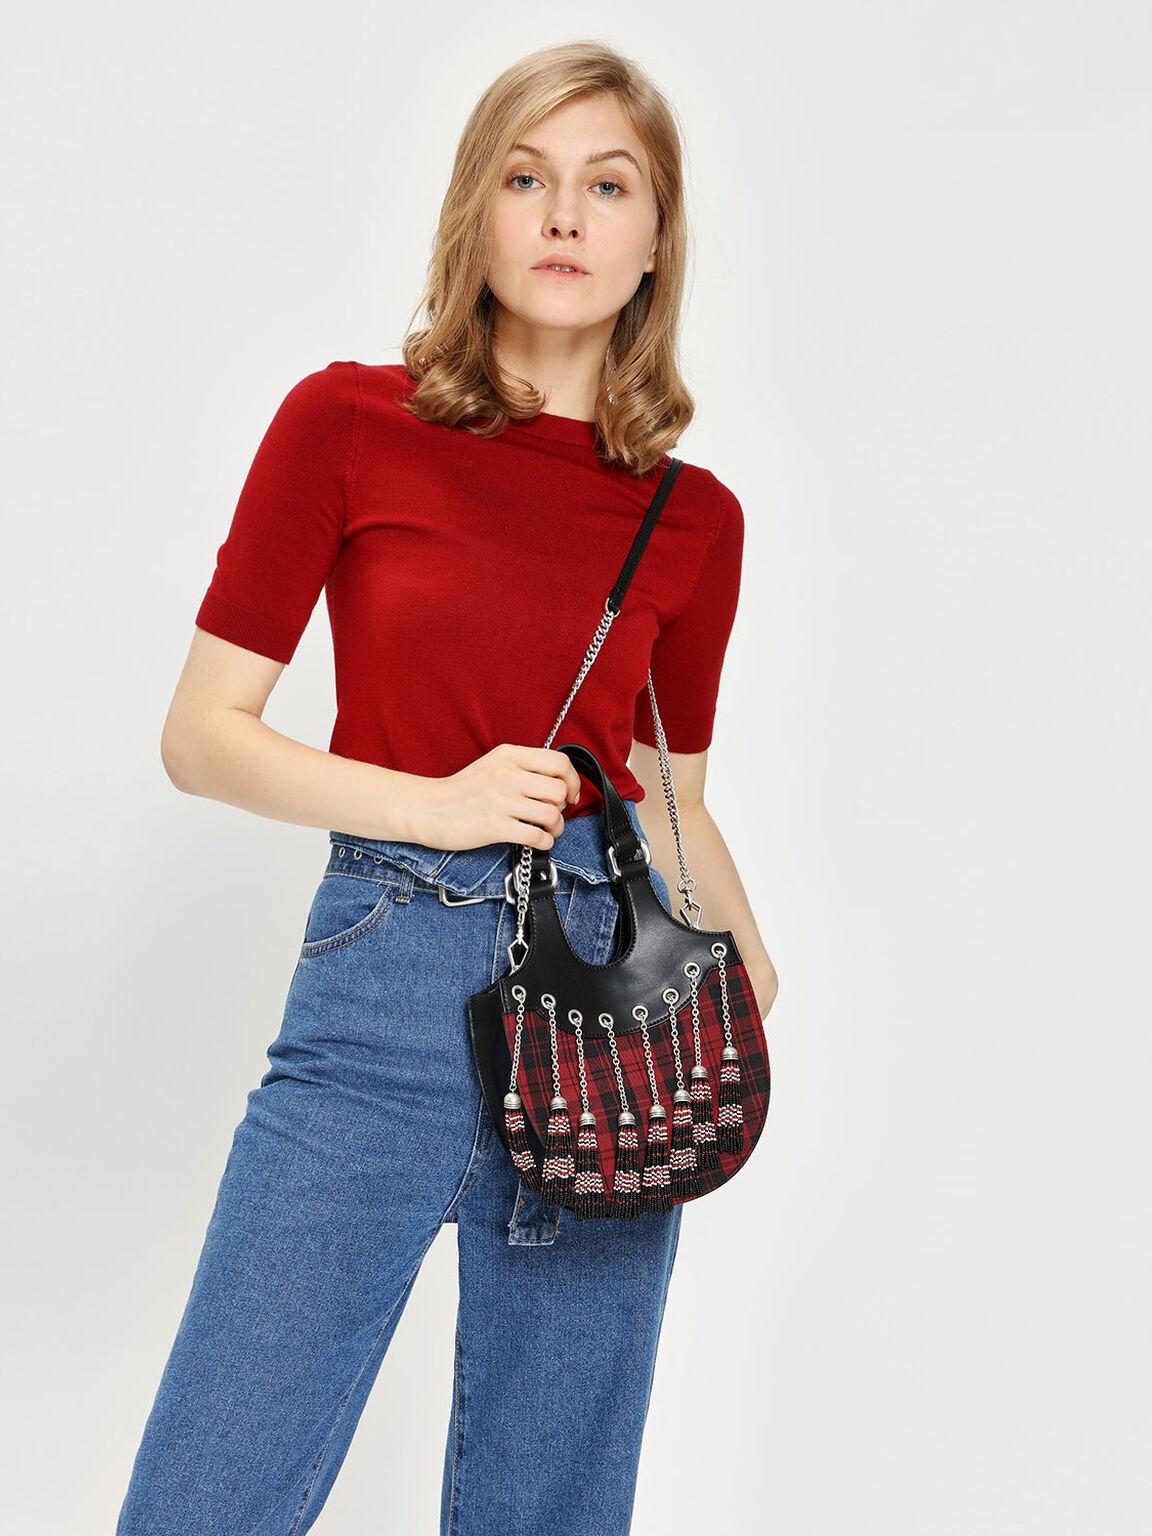 Tassel Detail Hobo Bag, Multi, hi-res